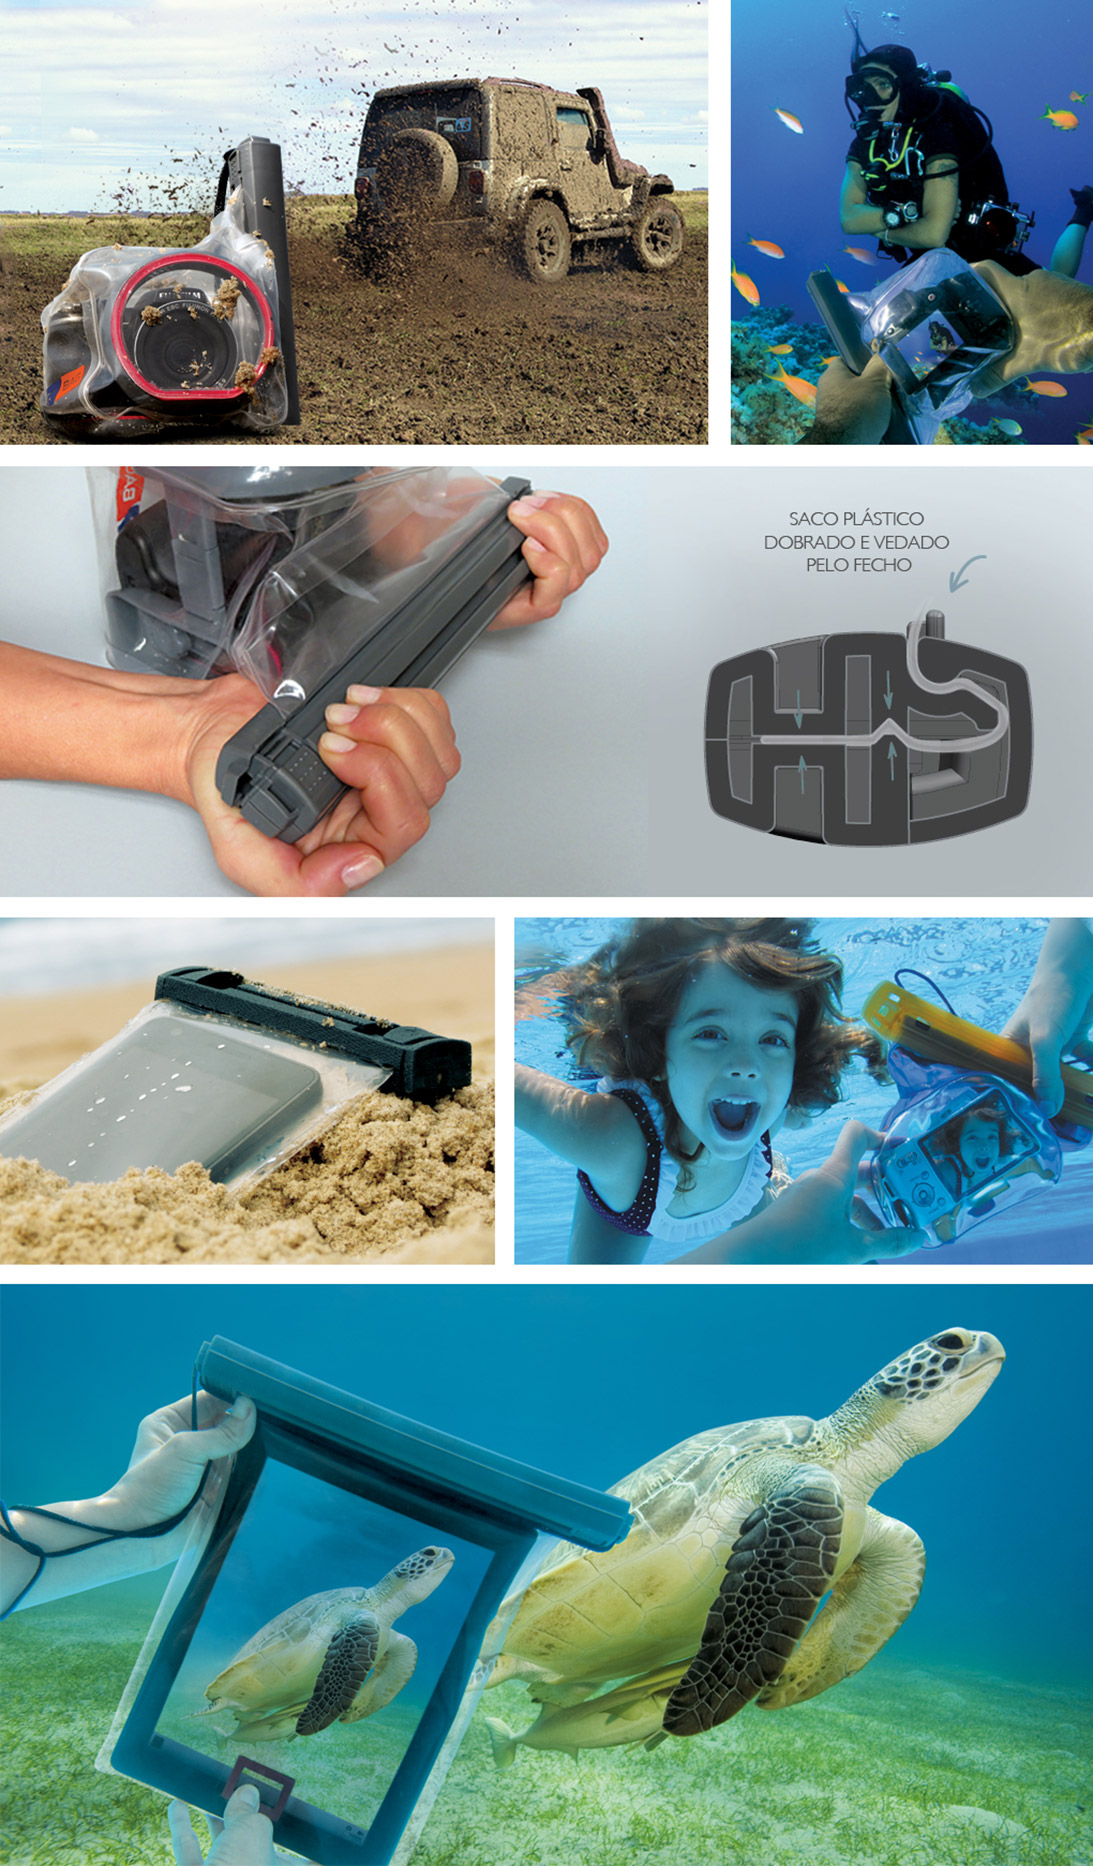 chelles-e-hayashi-design-portfolio-dartbag-fechos-bolsas-estanque-produto-estrutural-saco-protecao